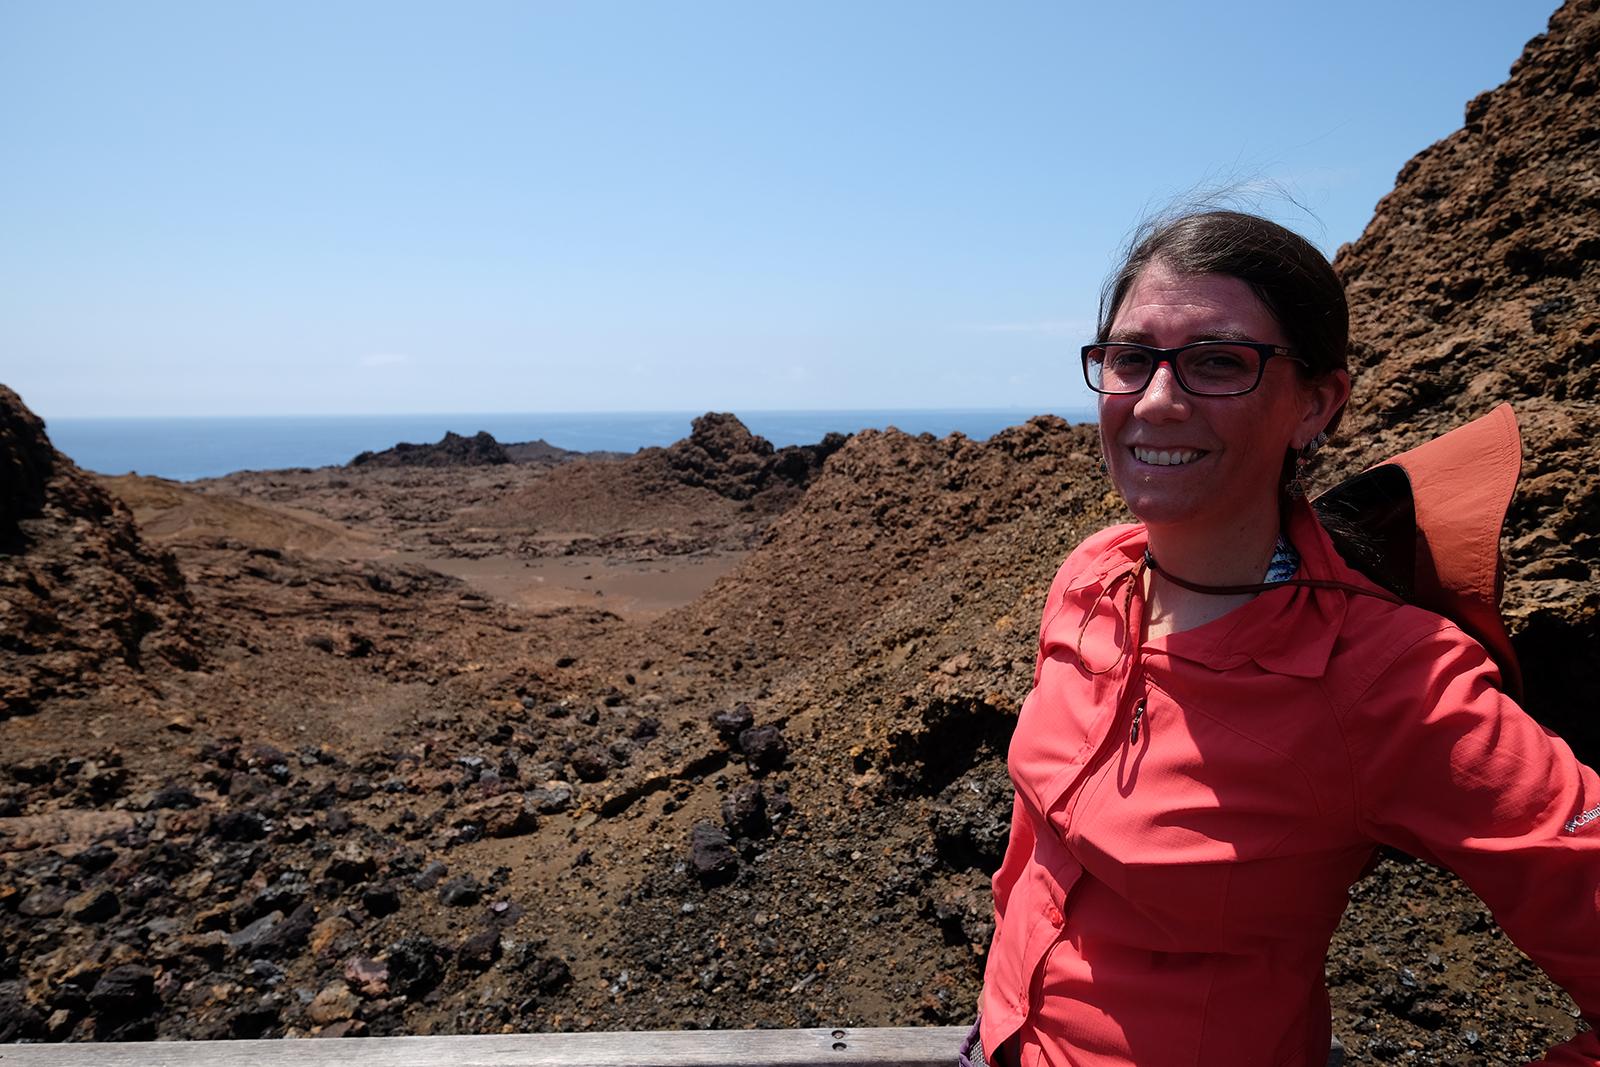 02_San_Bartolme_01_rocas_volcanicas.JPG